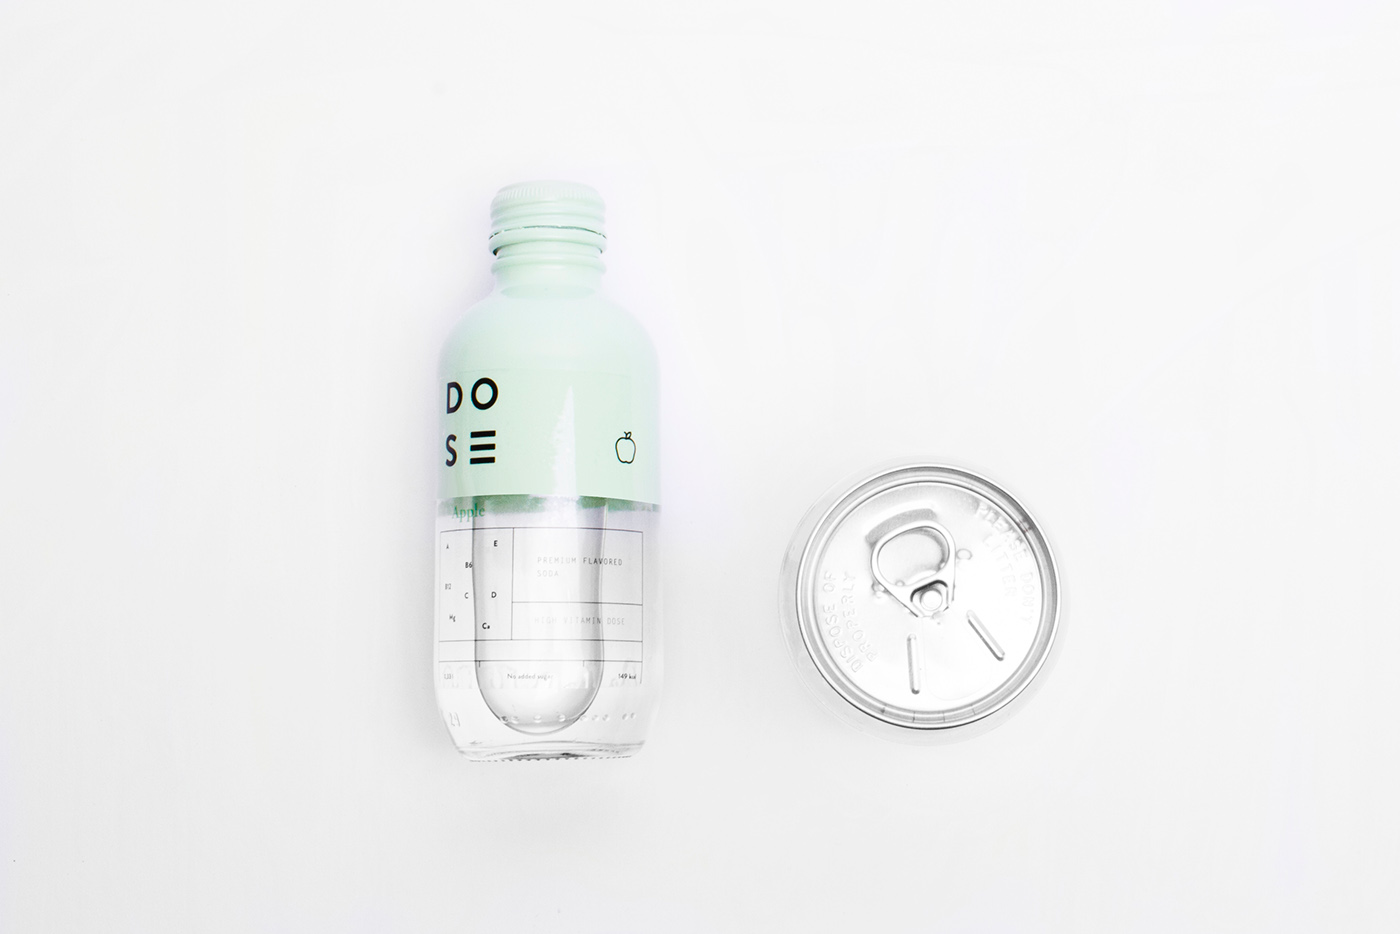 dose soda drink brand Pack bottle glass color Fruit logo geometric graphic design typo identity